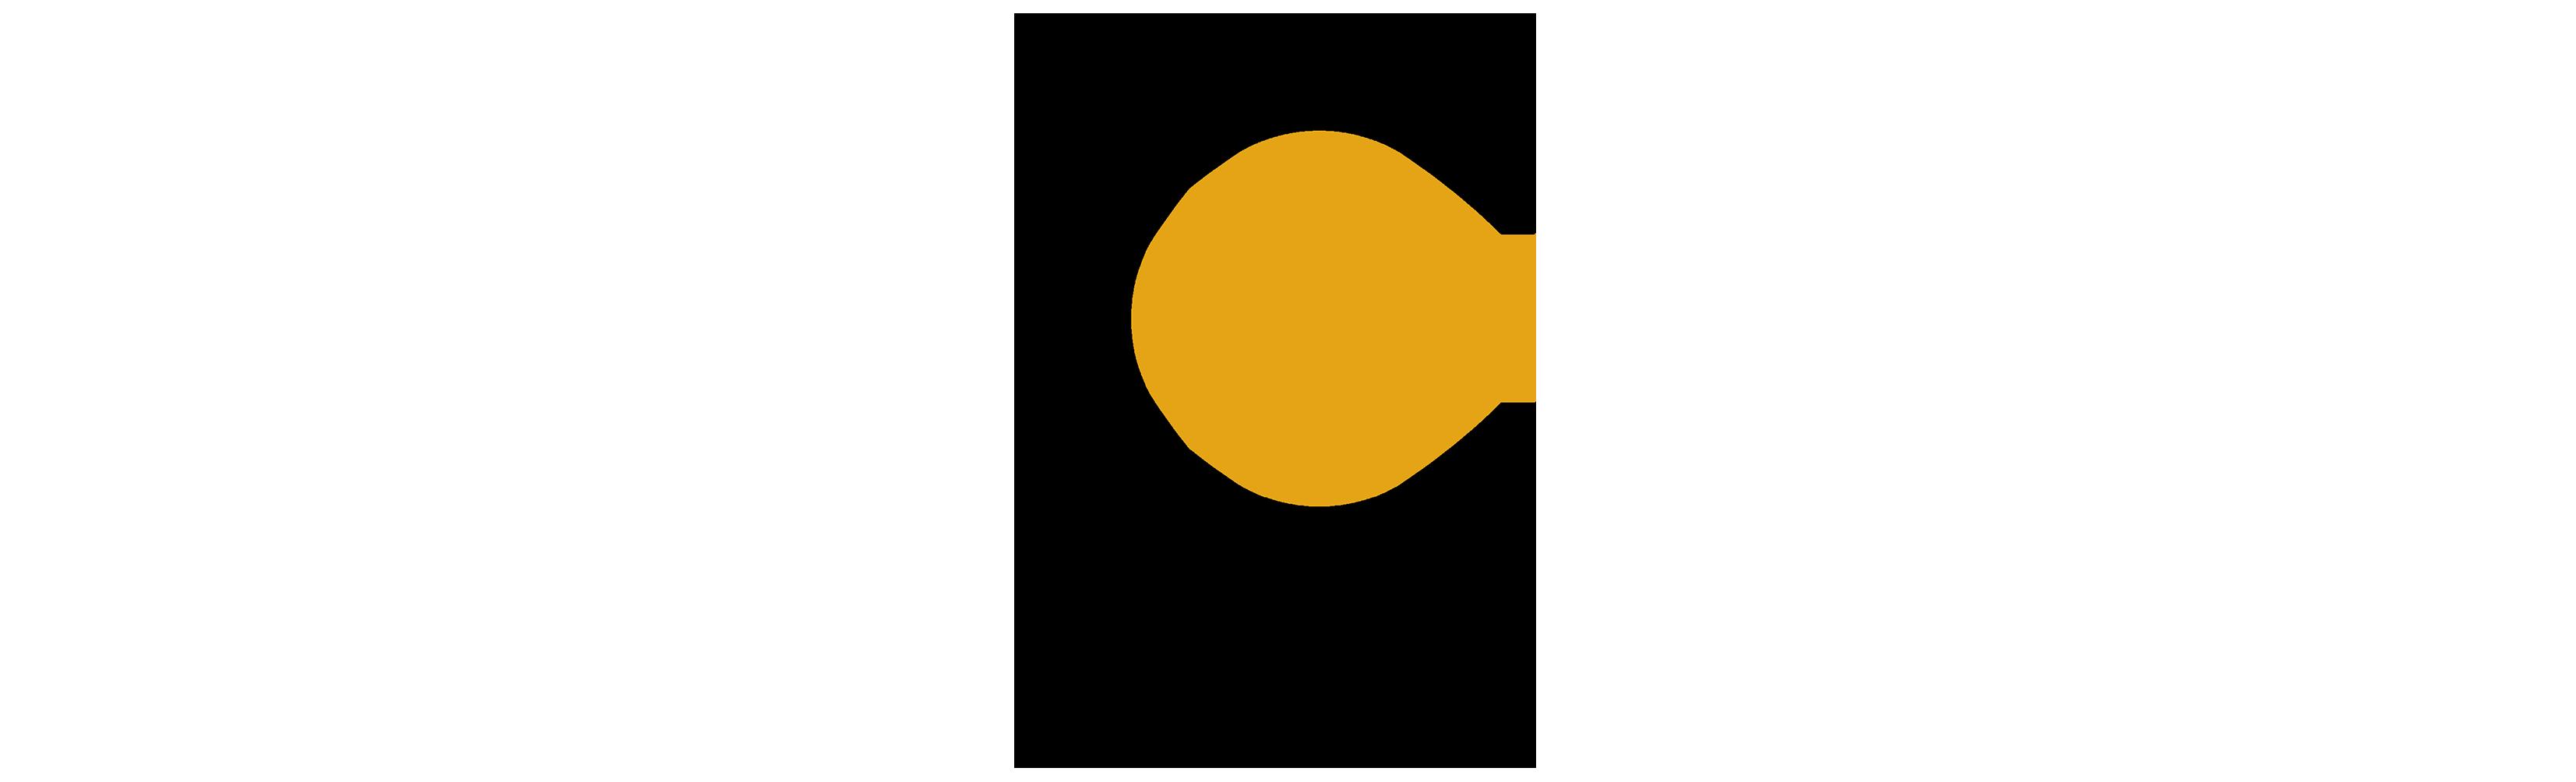 Cabify Logo photo - 1